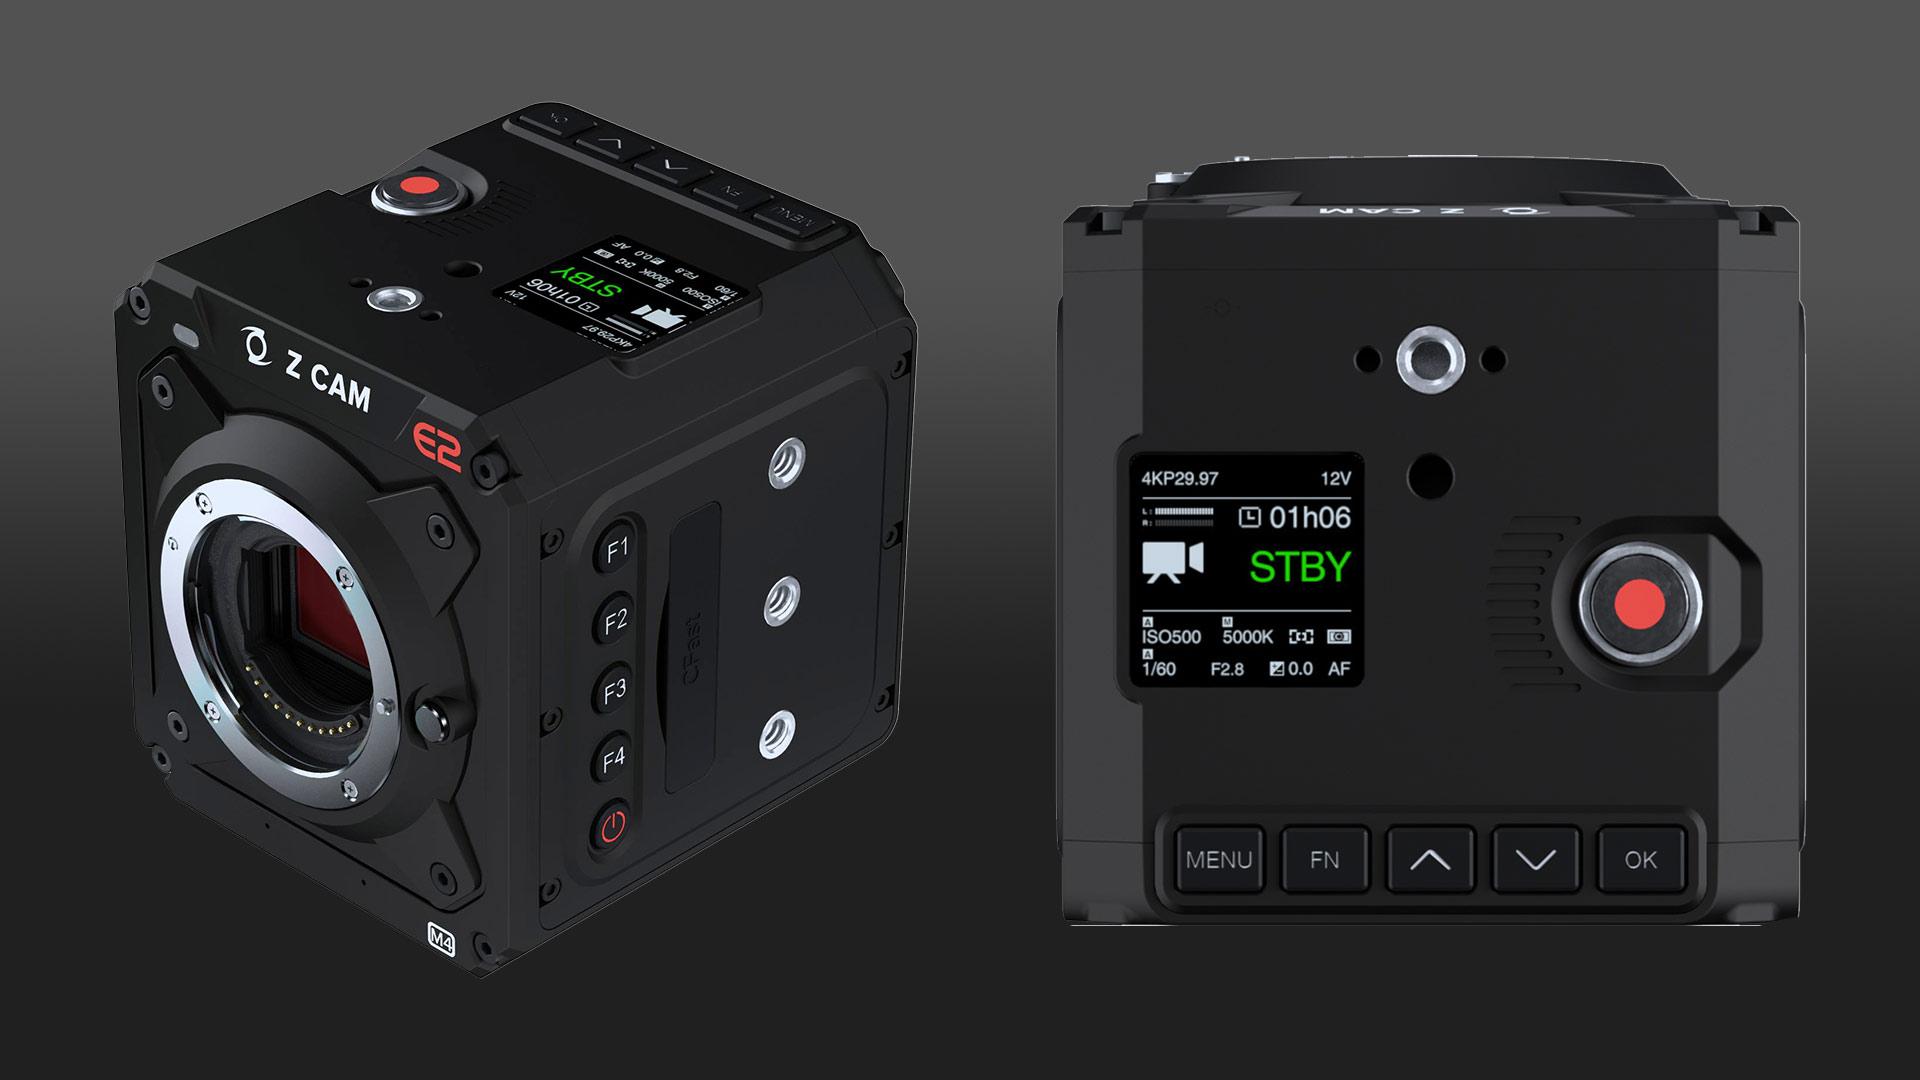 Z CAM E2-M4 Camera Announced, E2 S6 and F6 Price Drops - cinema5D news